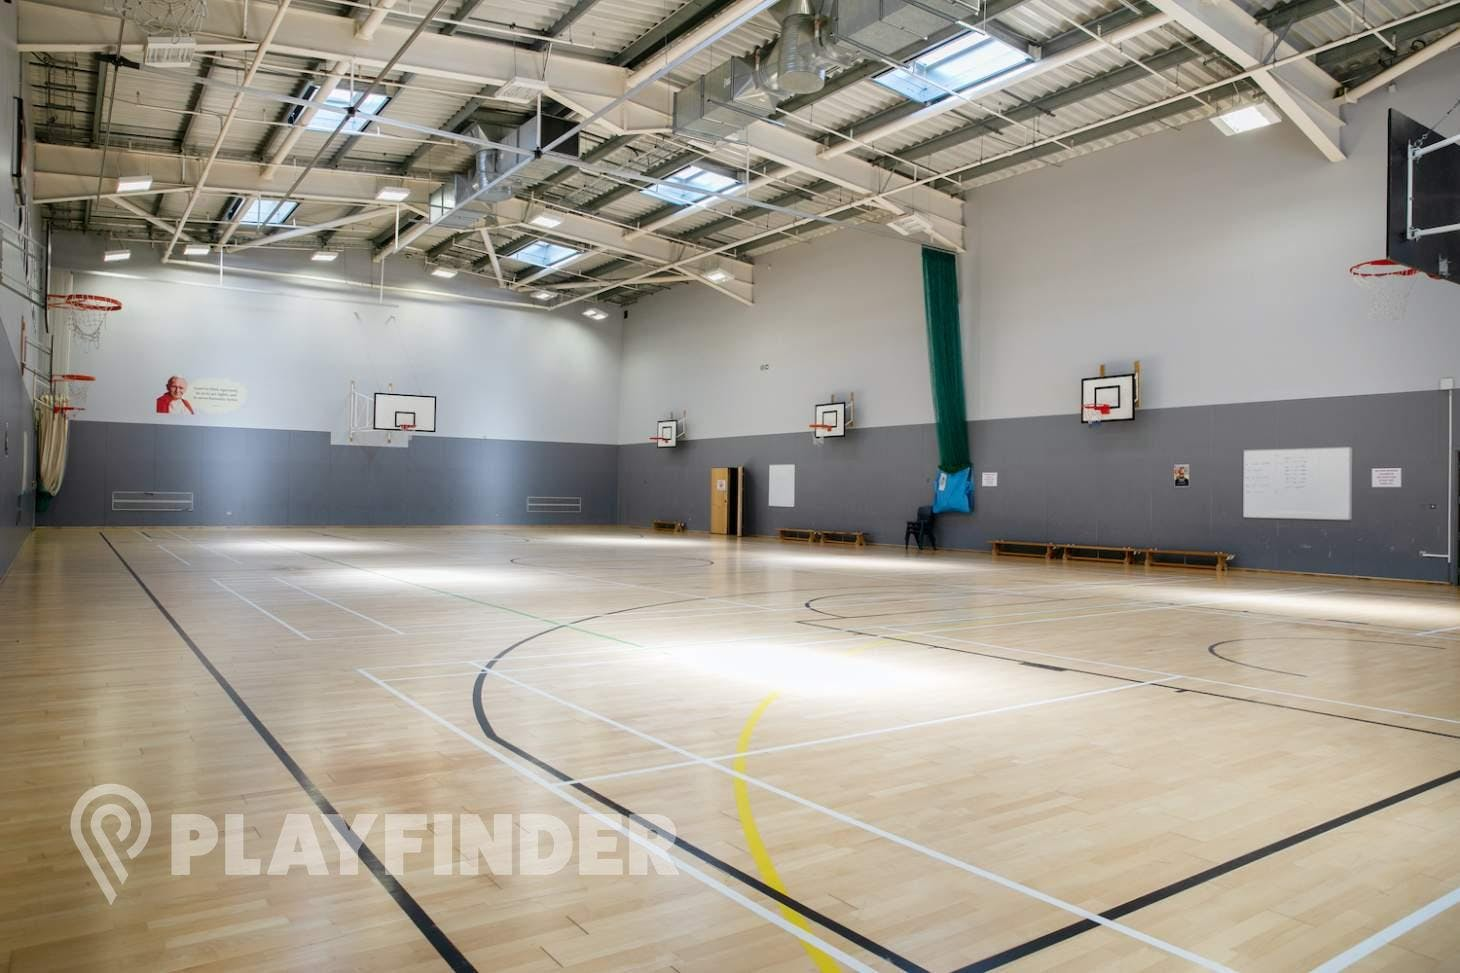 St Aloysius' College Court | Sports hall netball court